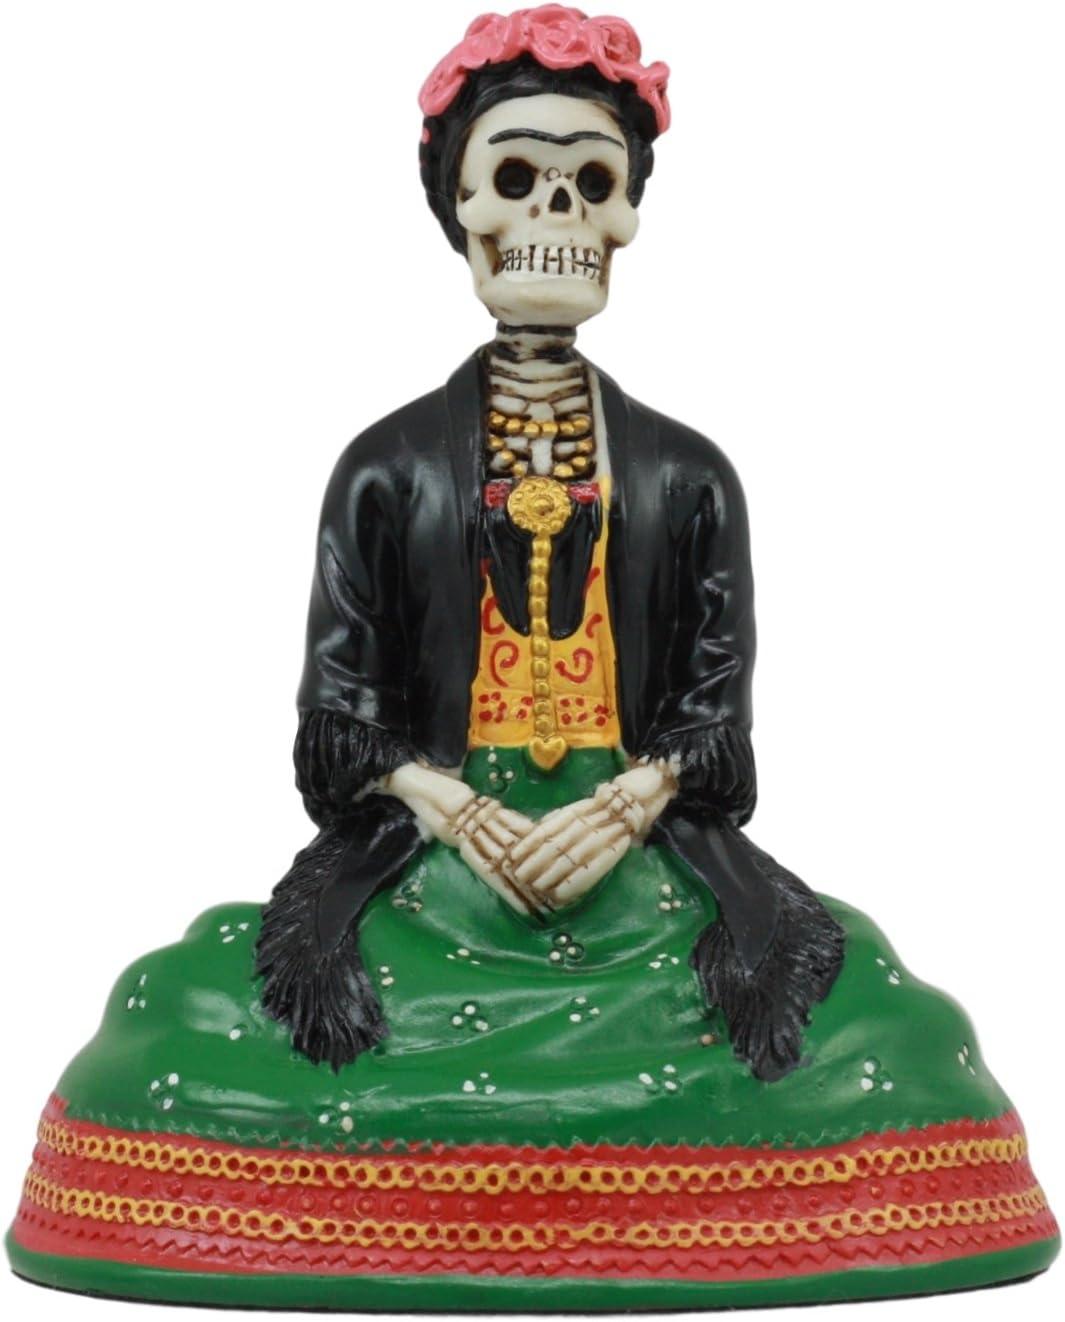 Gifts & Decor Mexican Dias De Los Muertos Sitting Lady Skeleton Day of The Dead Sculpture Figurine